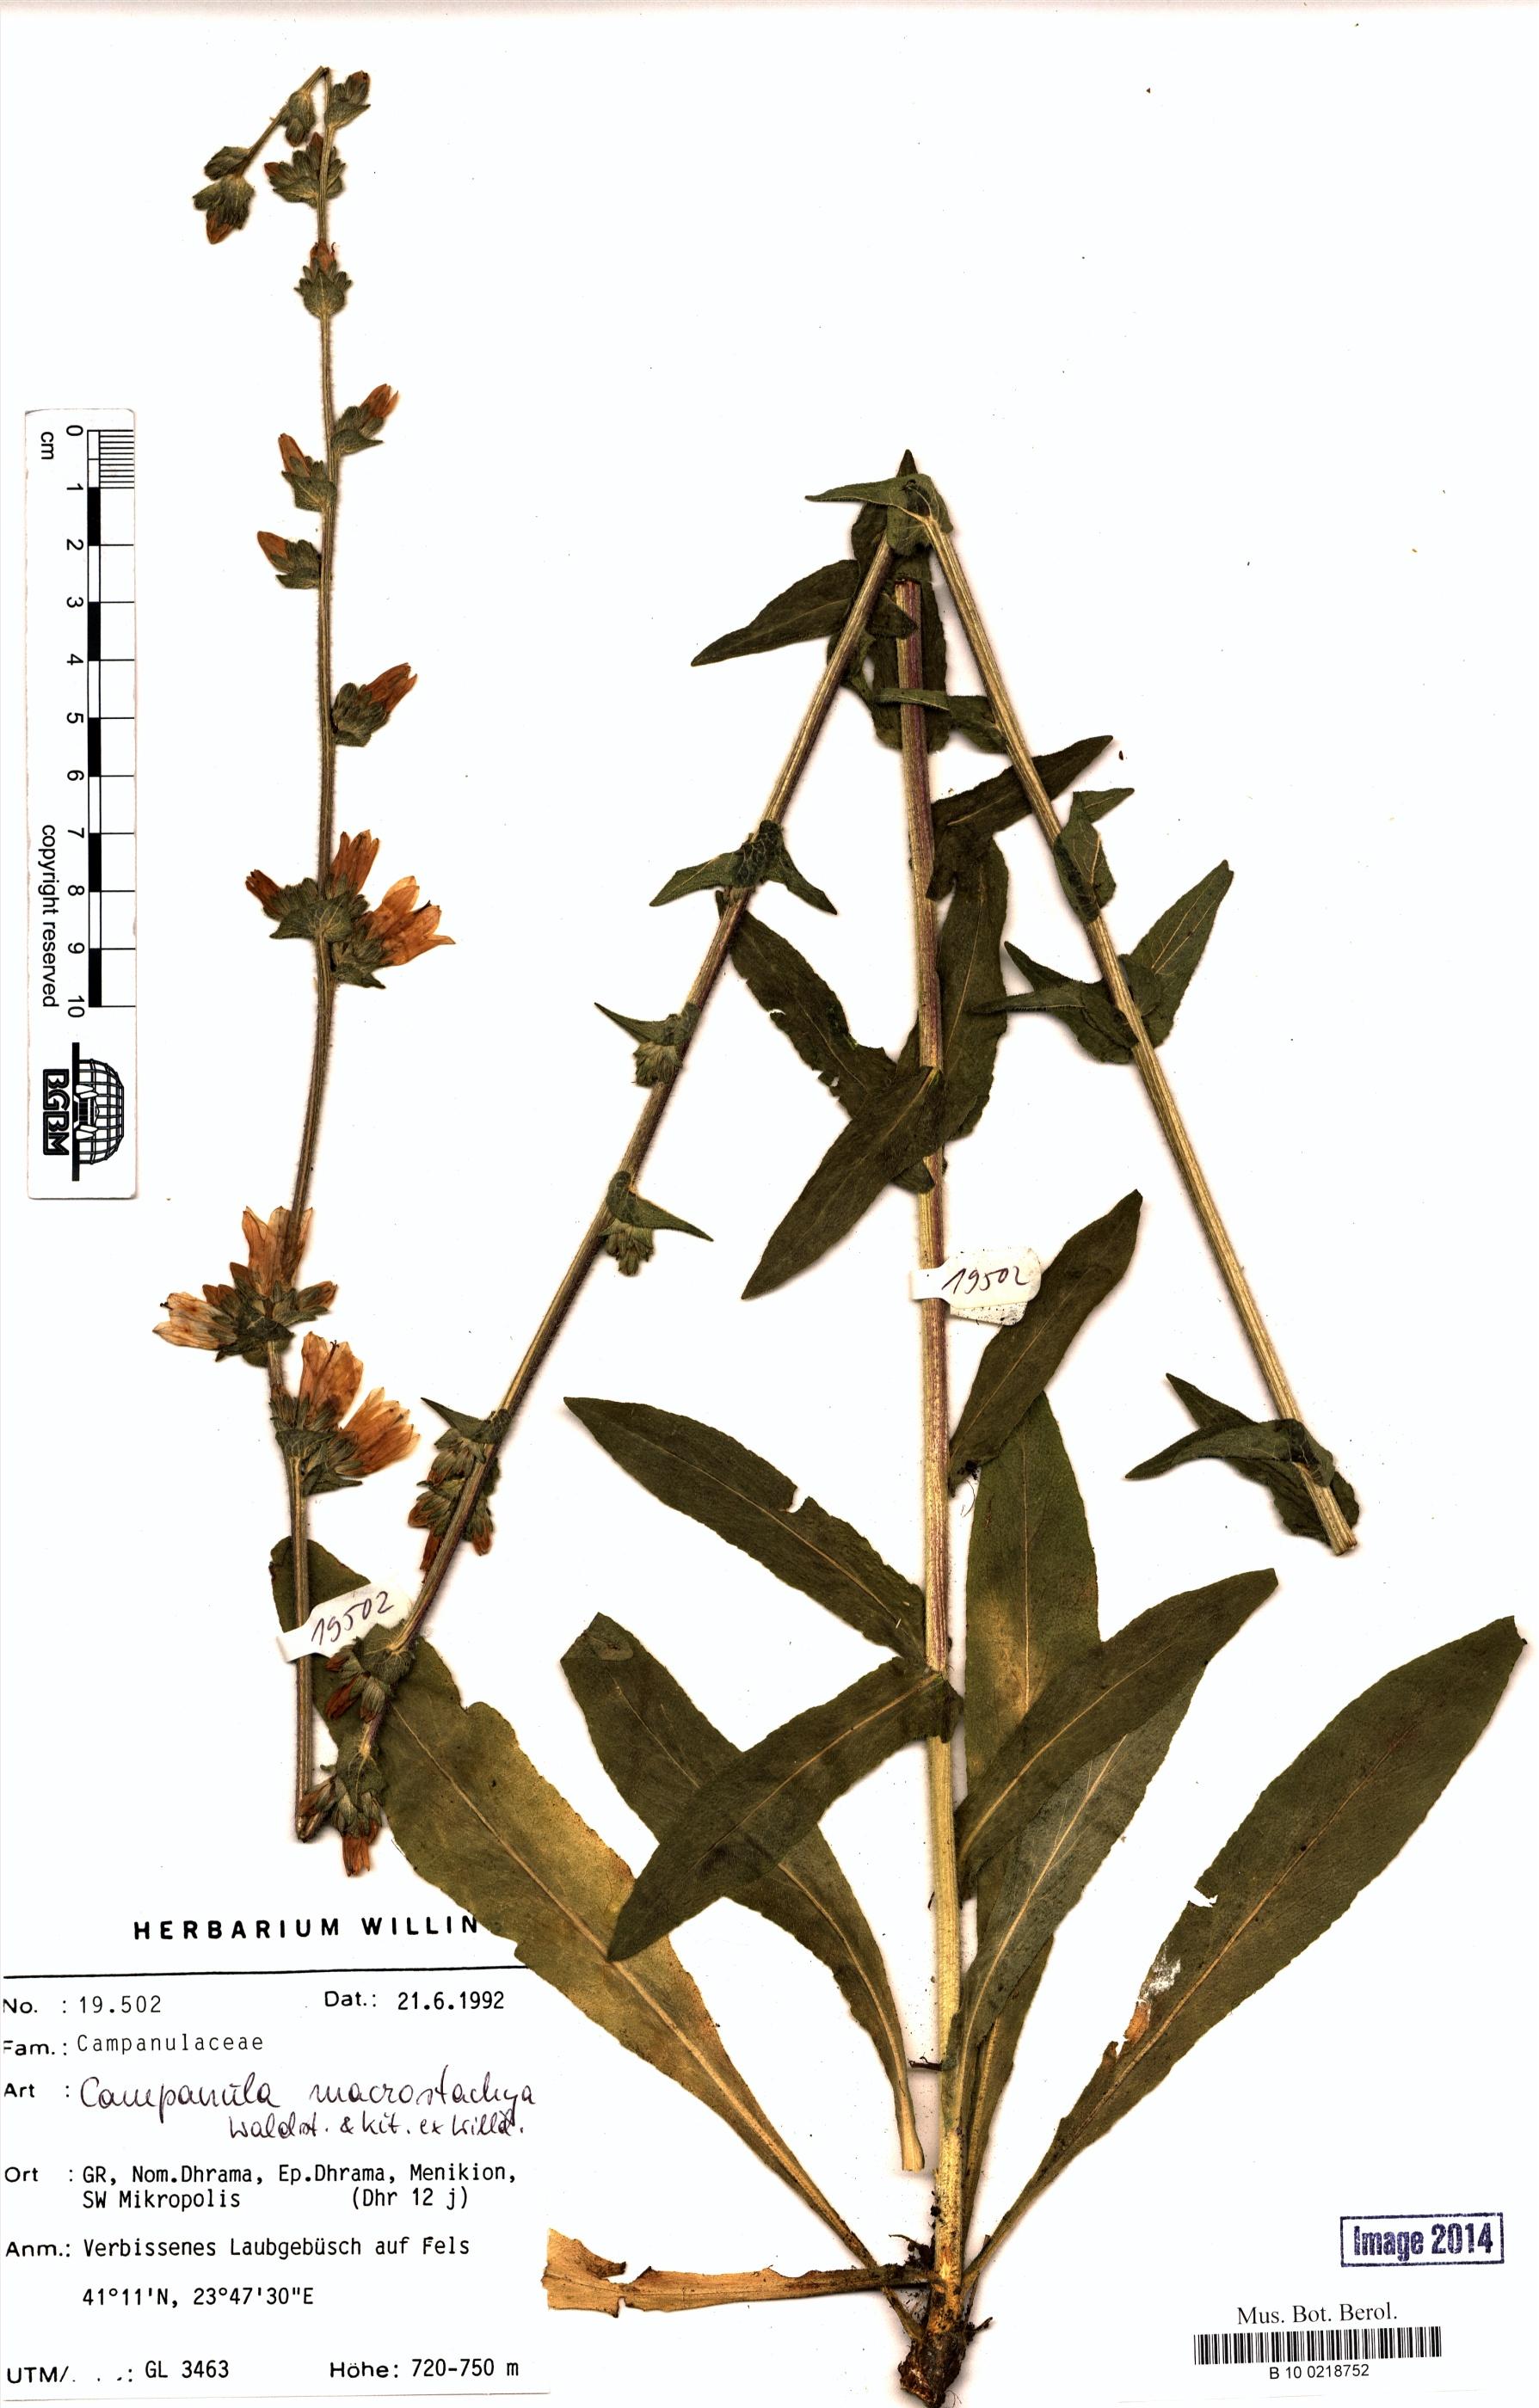 http://ww2.bgbm.org/herbarium/images/B/10/02/18/75/B_10_0218752.jpg